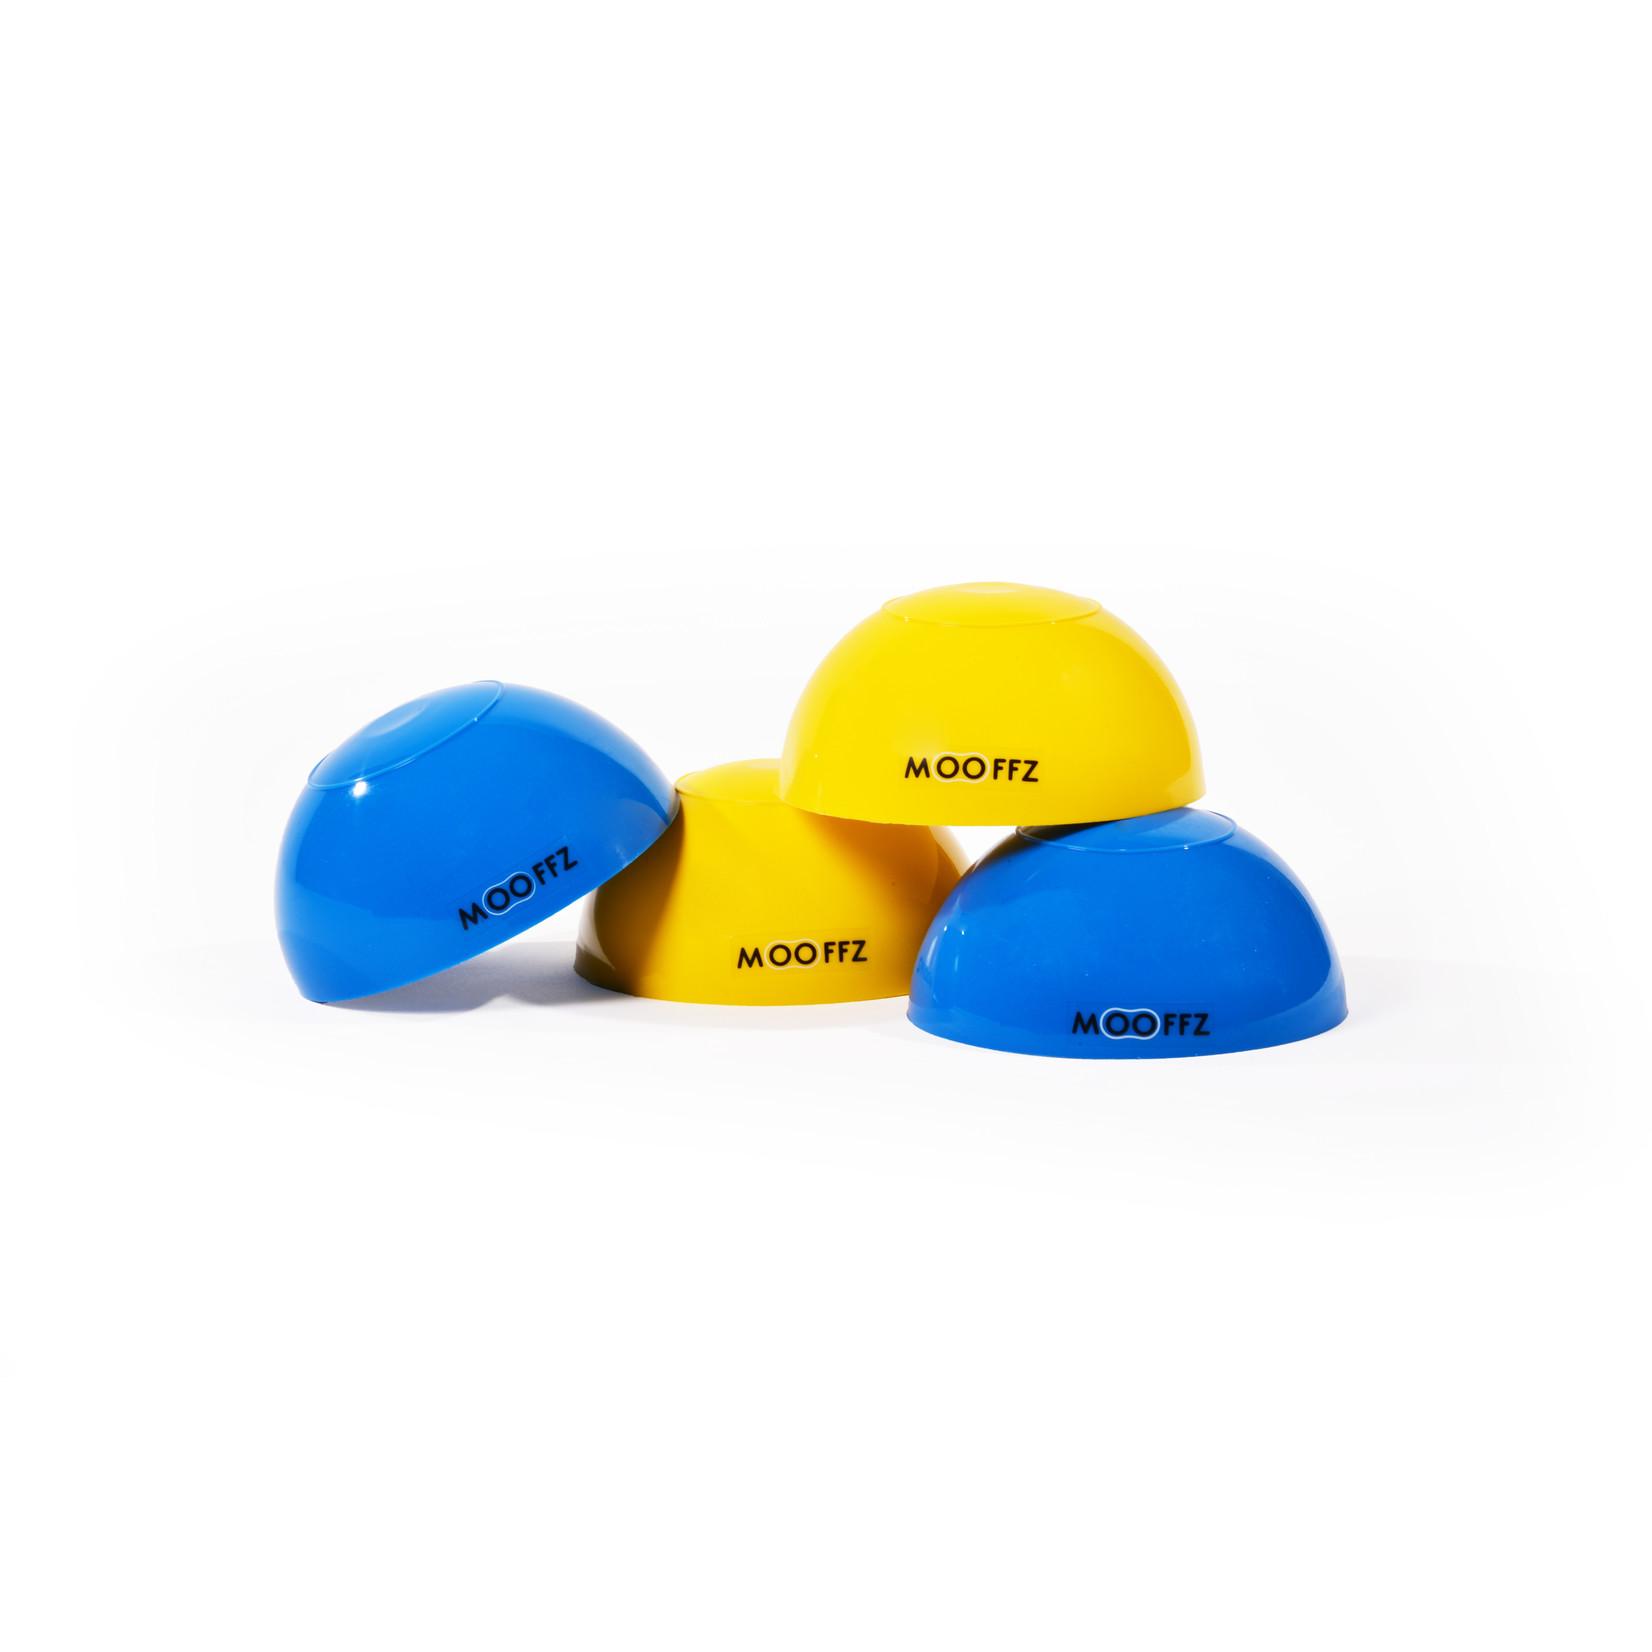 Mooffz stapstenen set van 4 (blauw/geel)